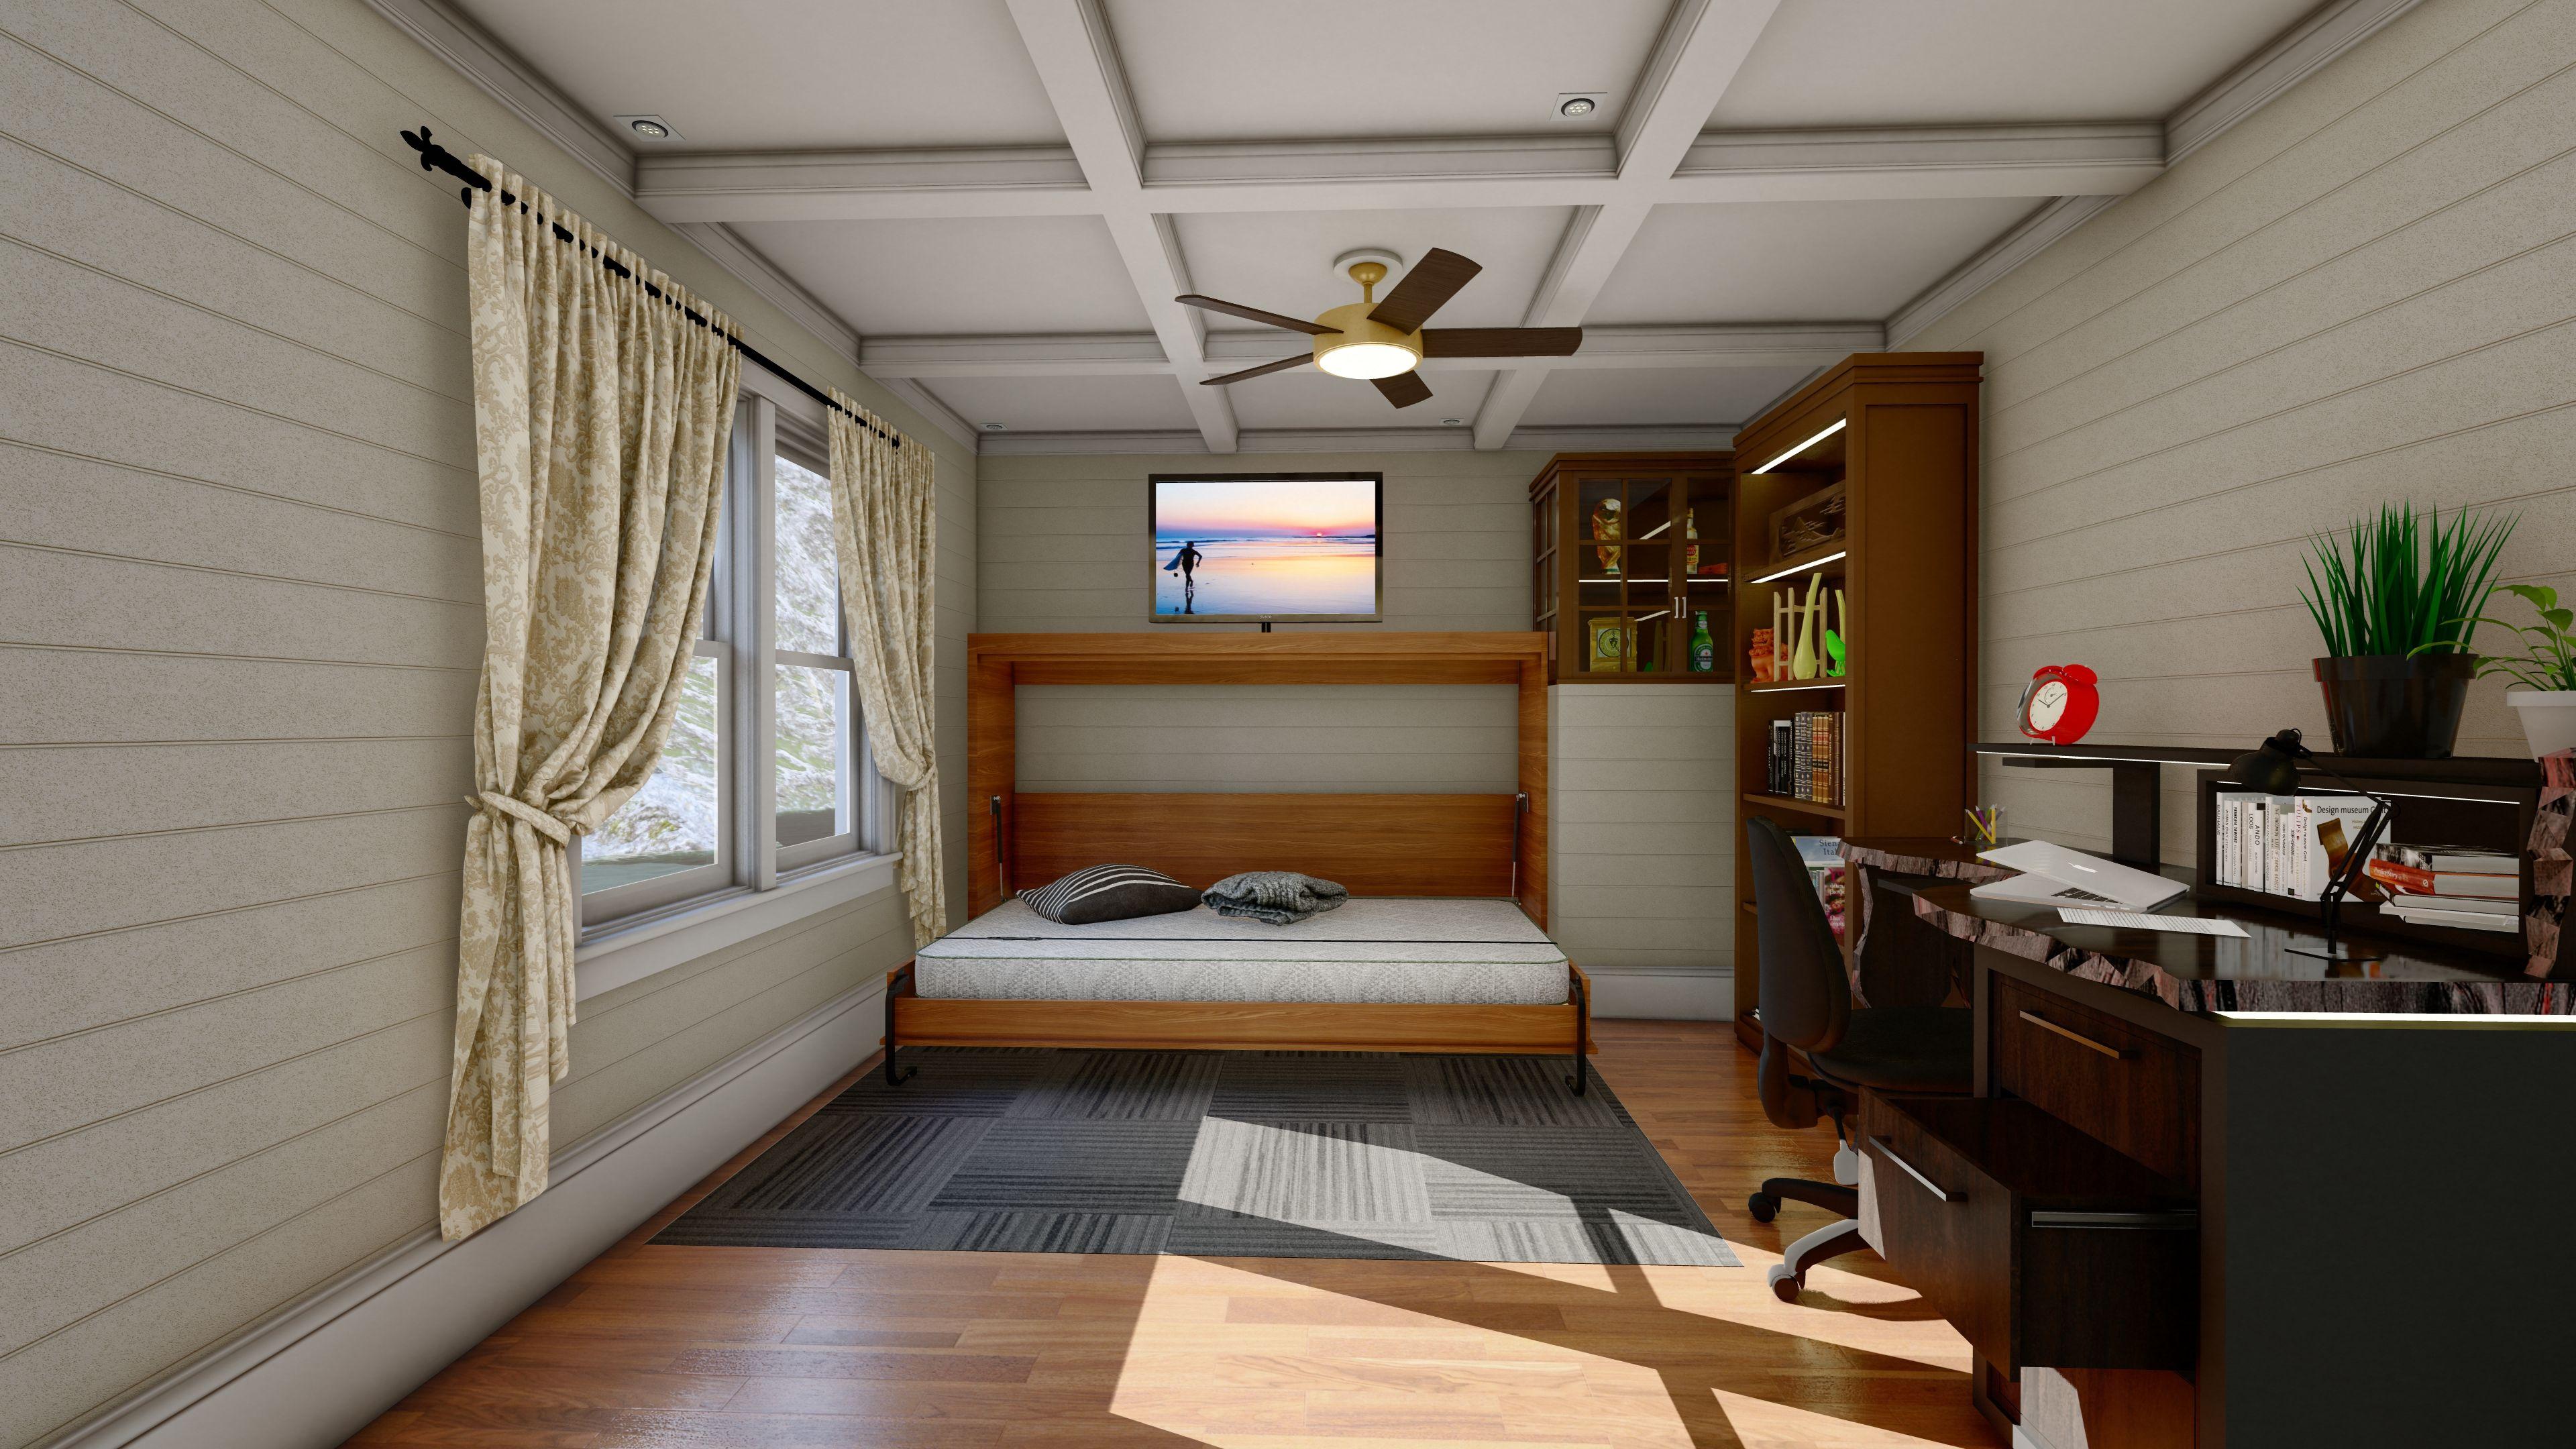 Vertical Murphy Bed Kit Murphy bed, Horizontal murphy